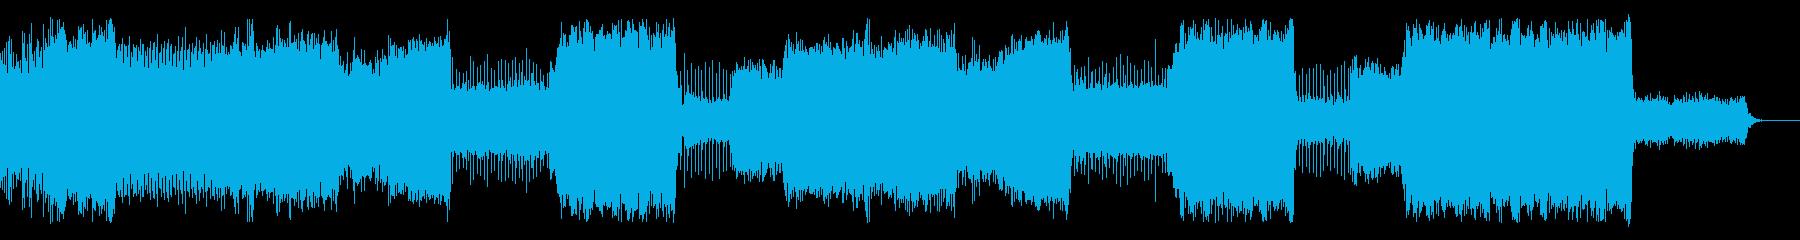 House/EDM/クラブ系ダンス/軽快の再生済みの波形